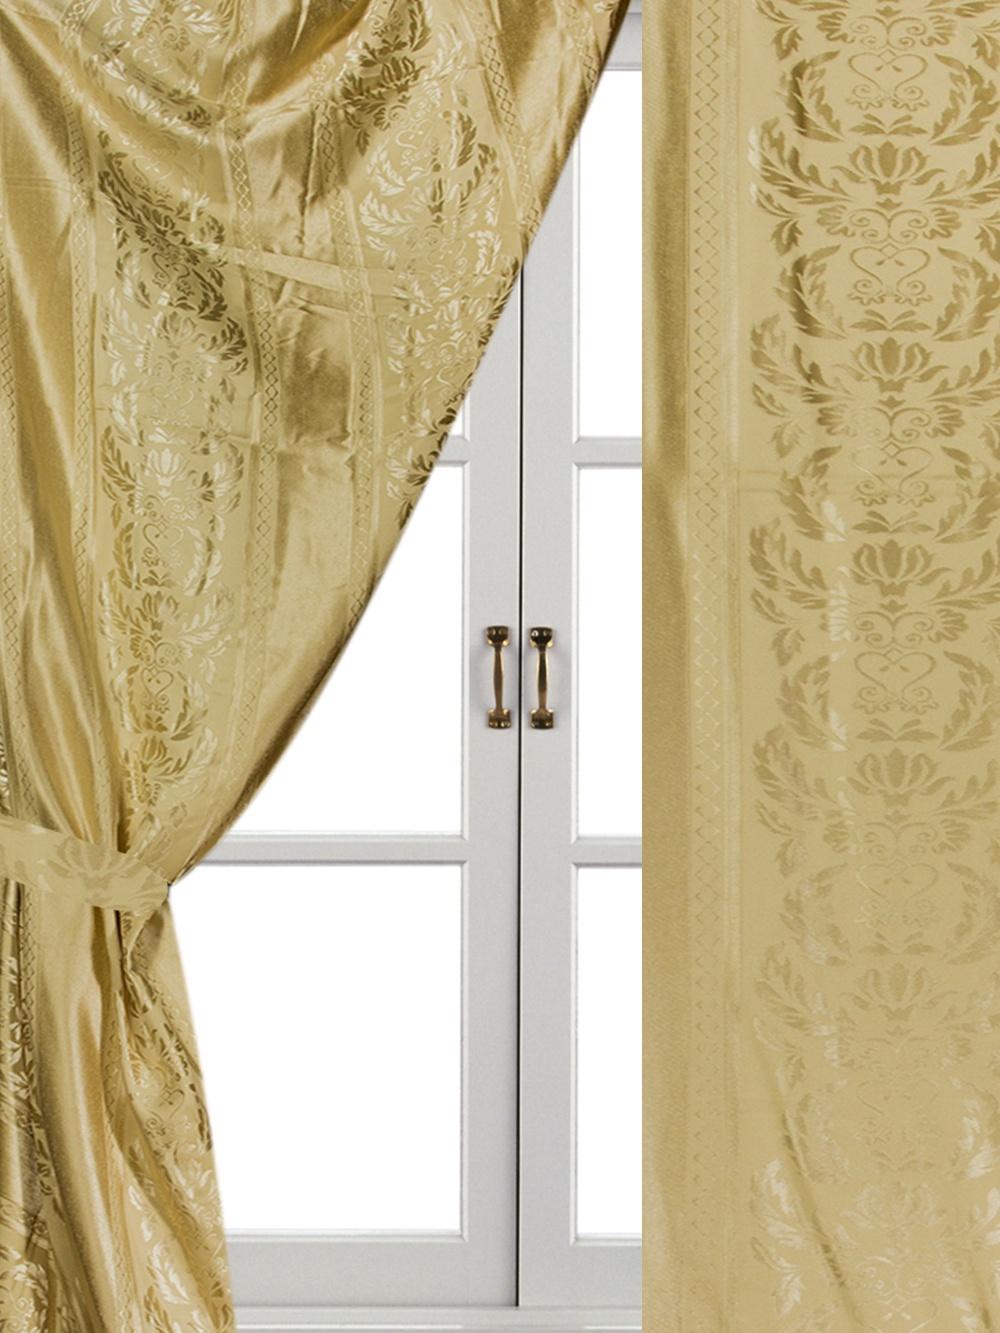 Шторы комнатные Айлант ОБ17 шторы homedeco нитяные шторы яркие кольца